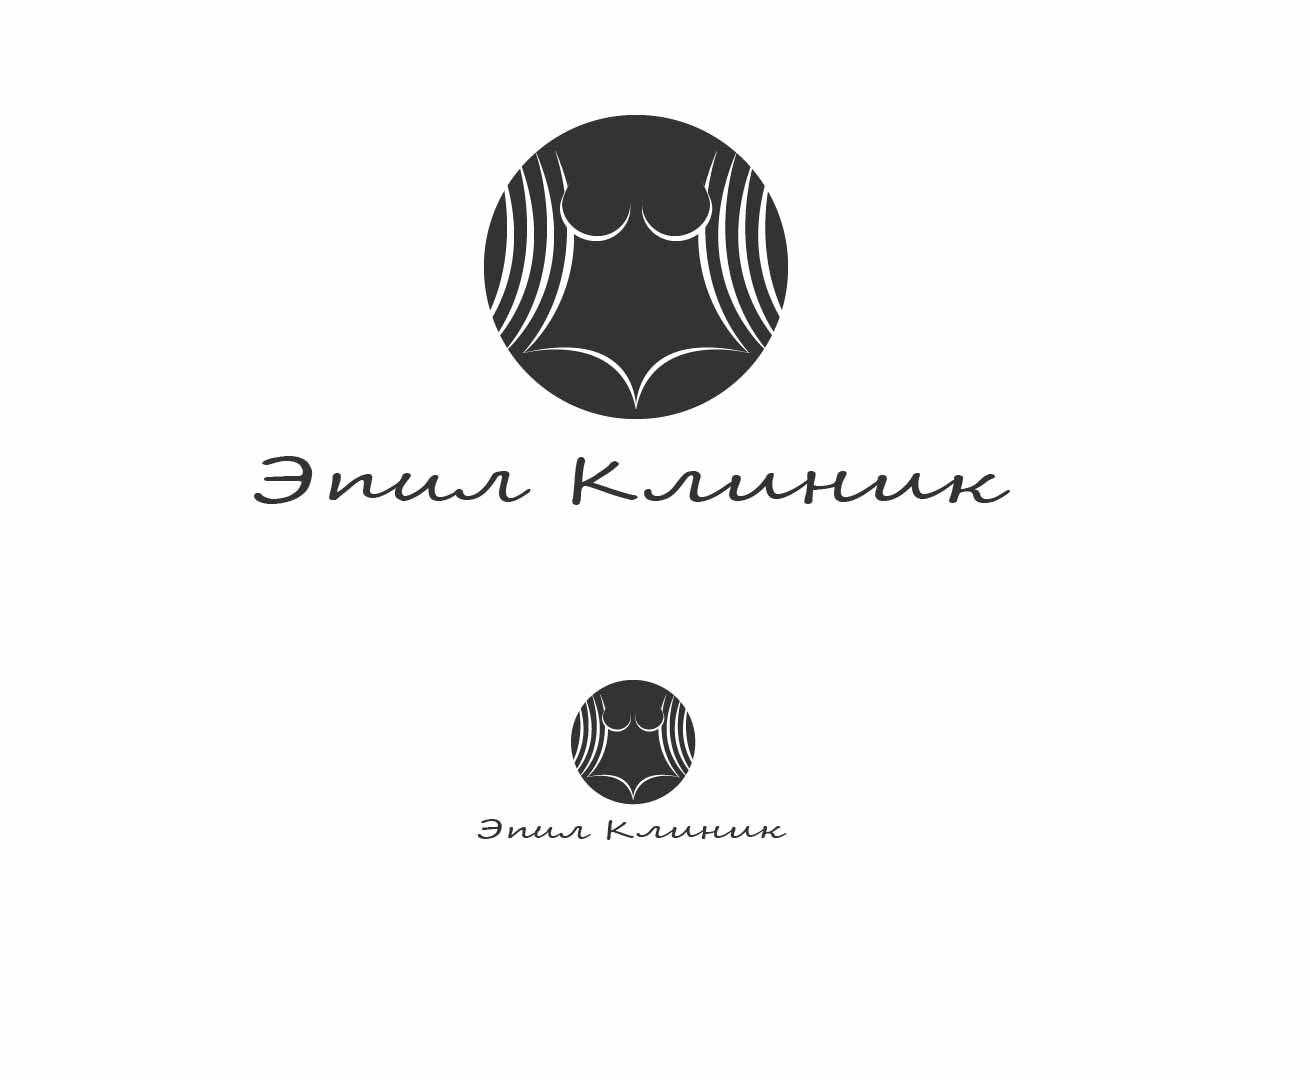 Логотип , фирменный стиль  фото f_5035e188ca23aee3.jpg